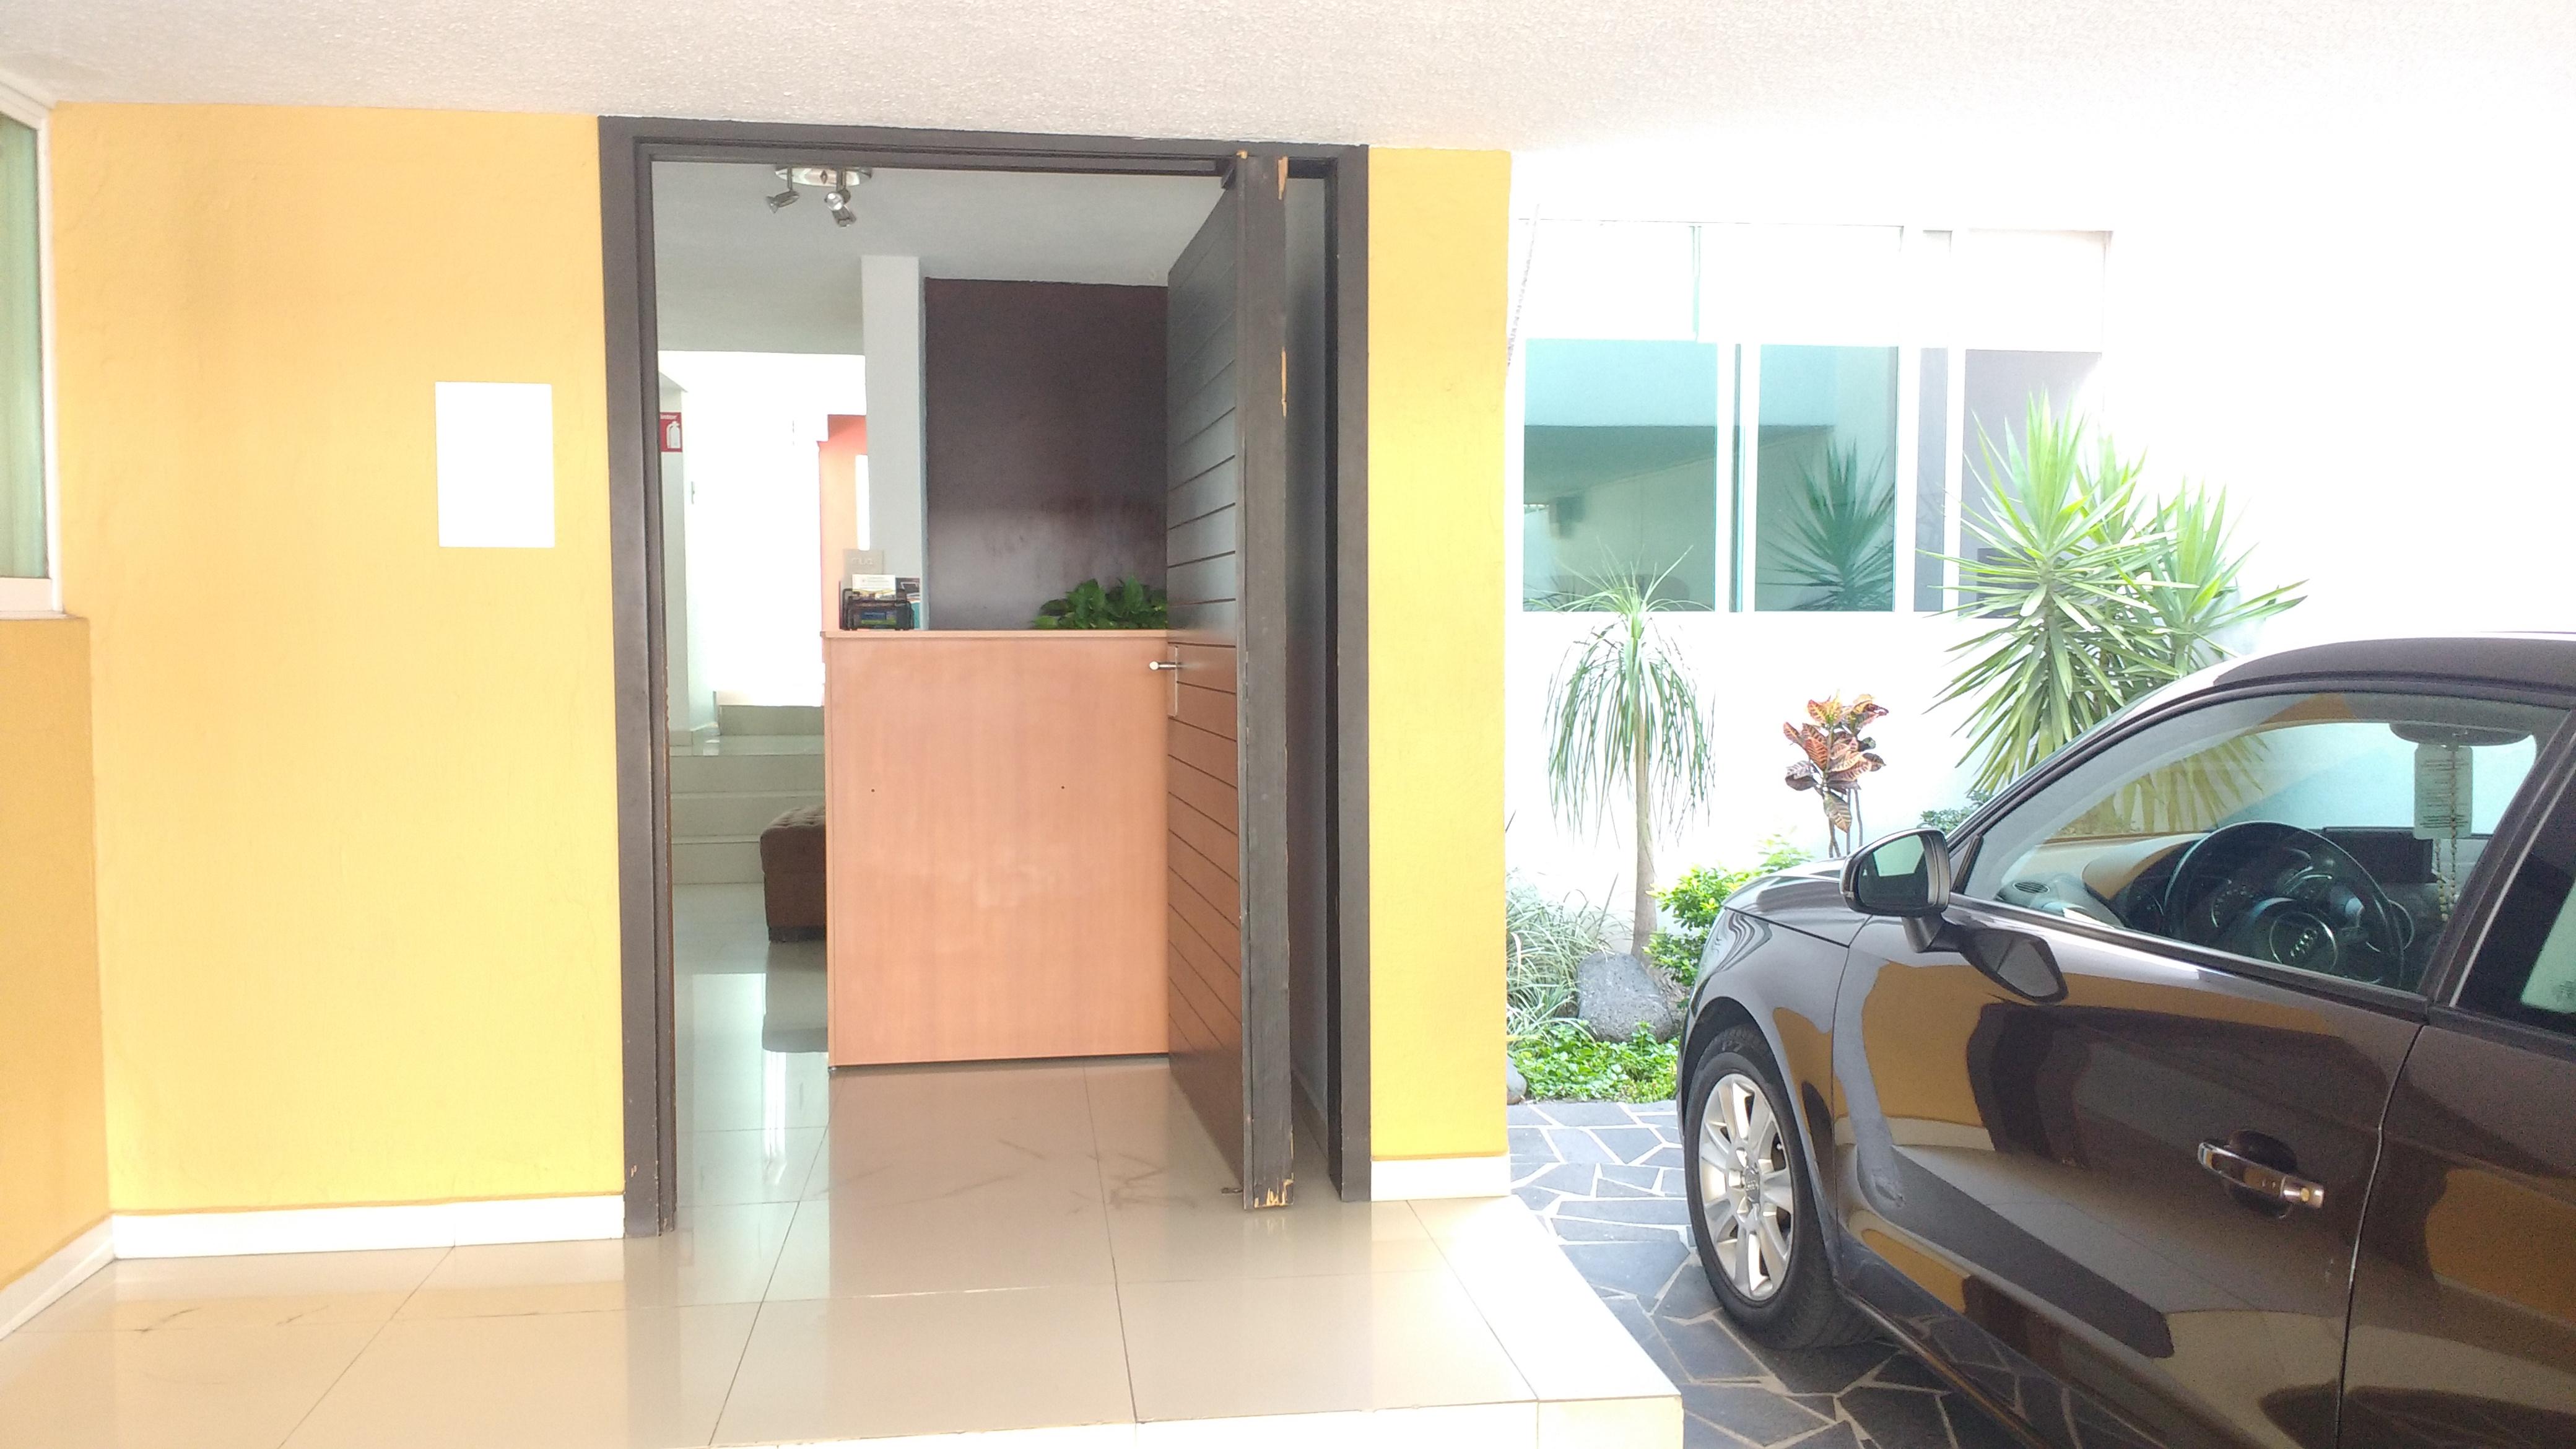 Promoción en oficinas virtuales con excelente ubicación